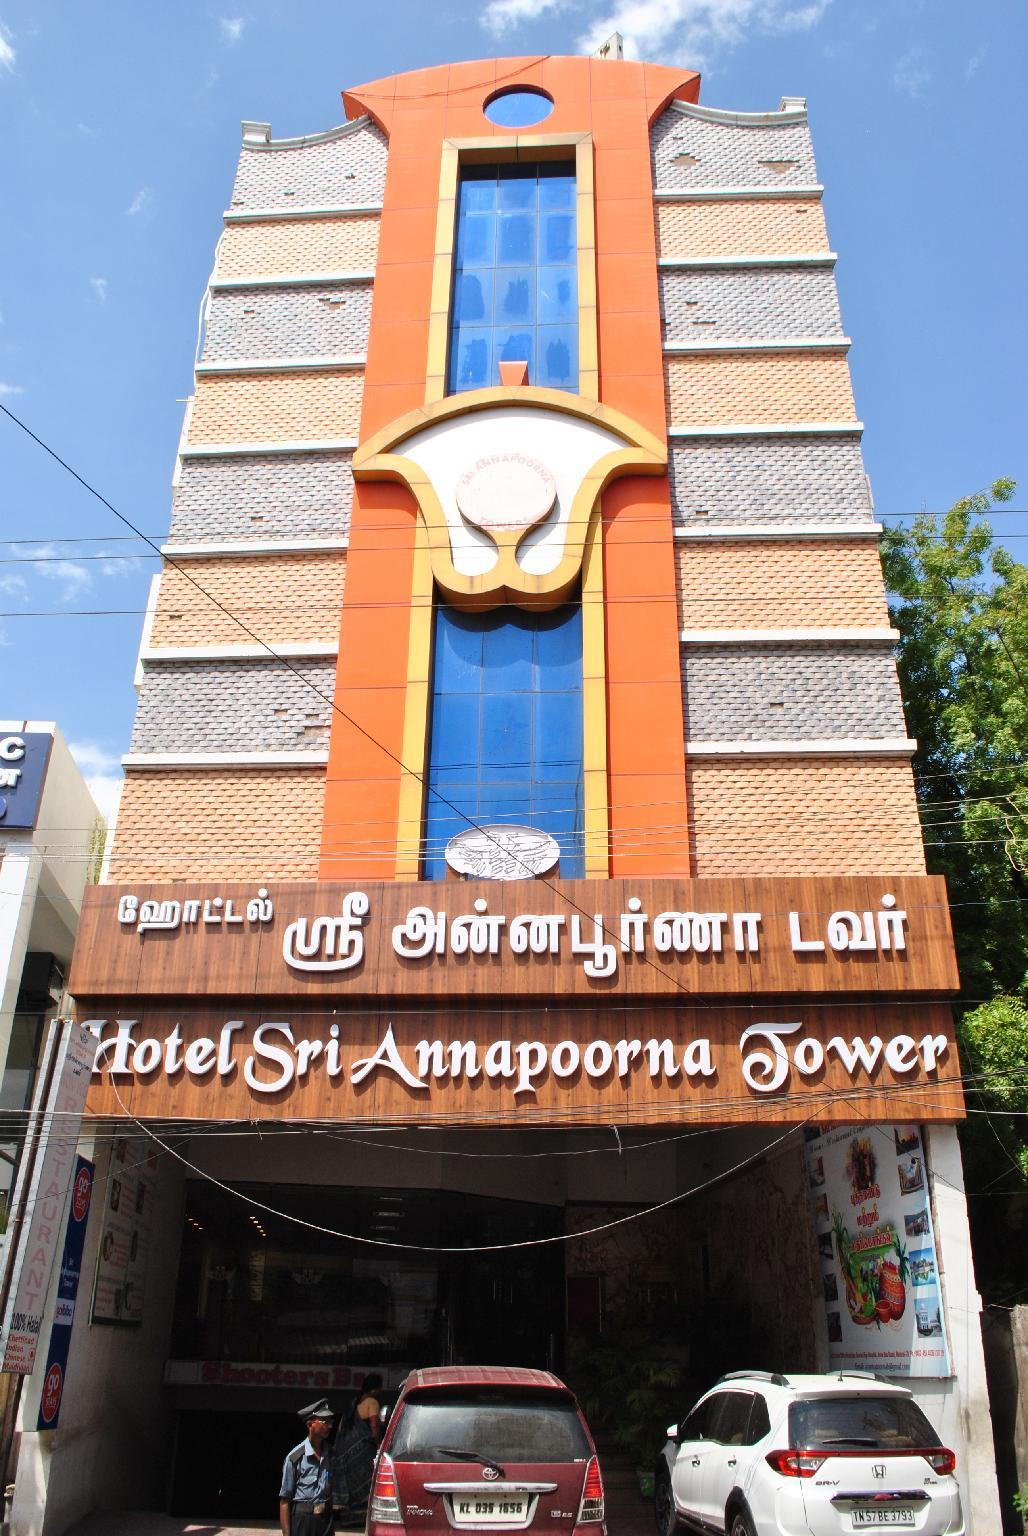 Sri Annapoorna Tower